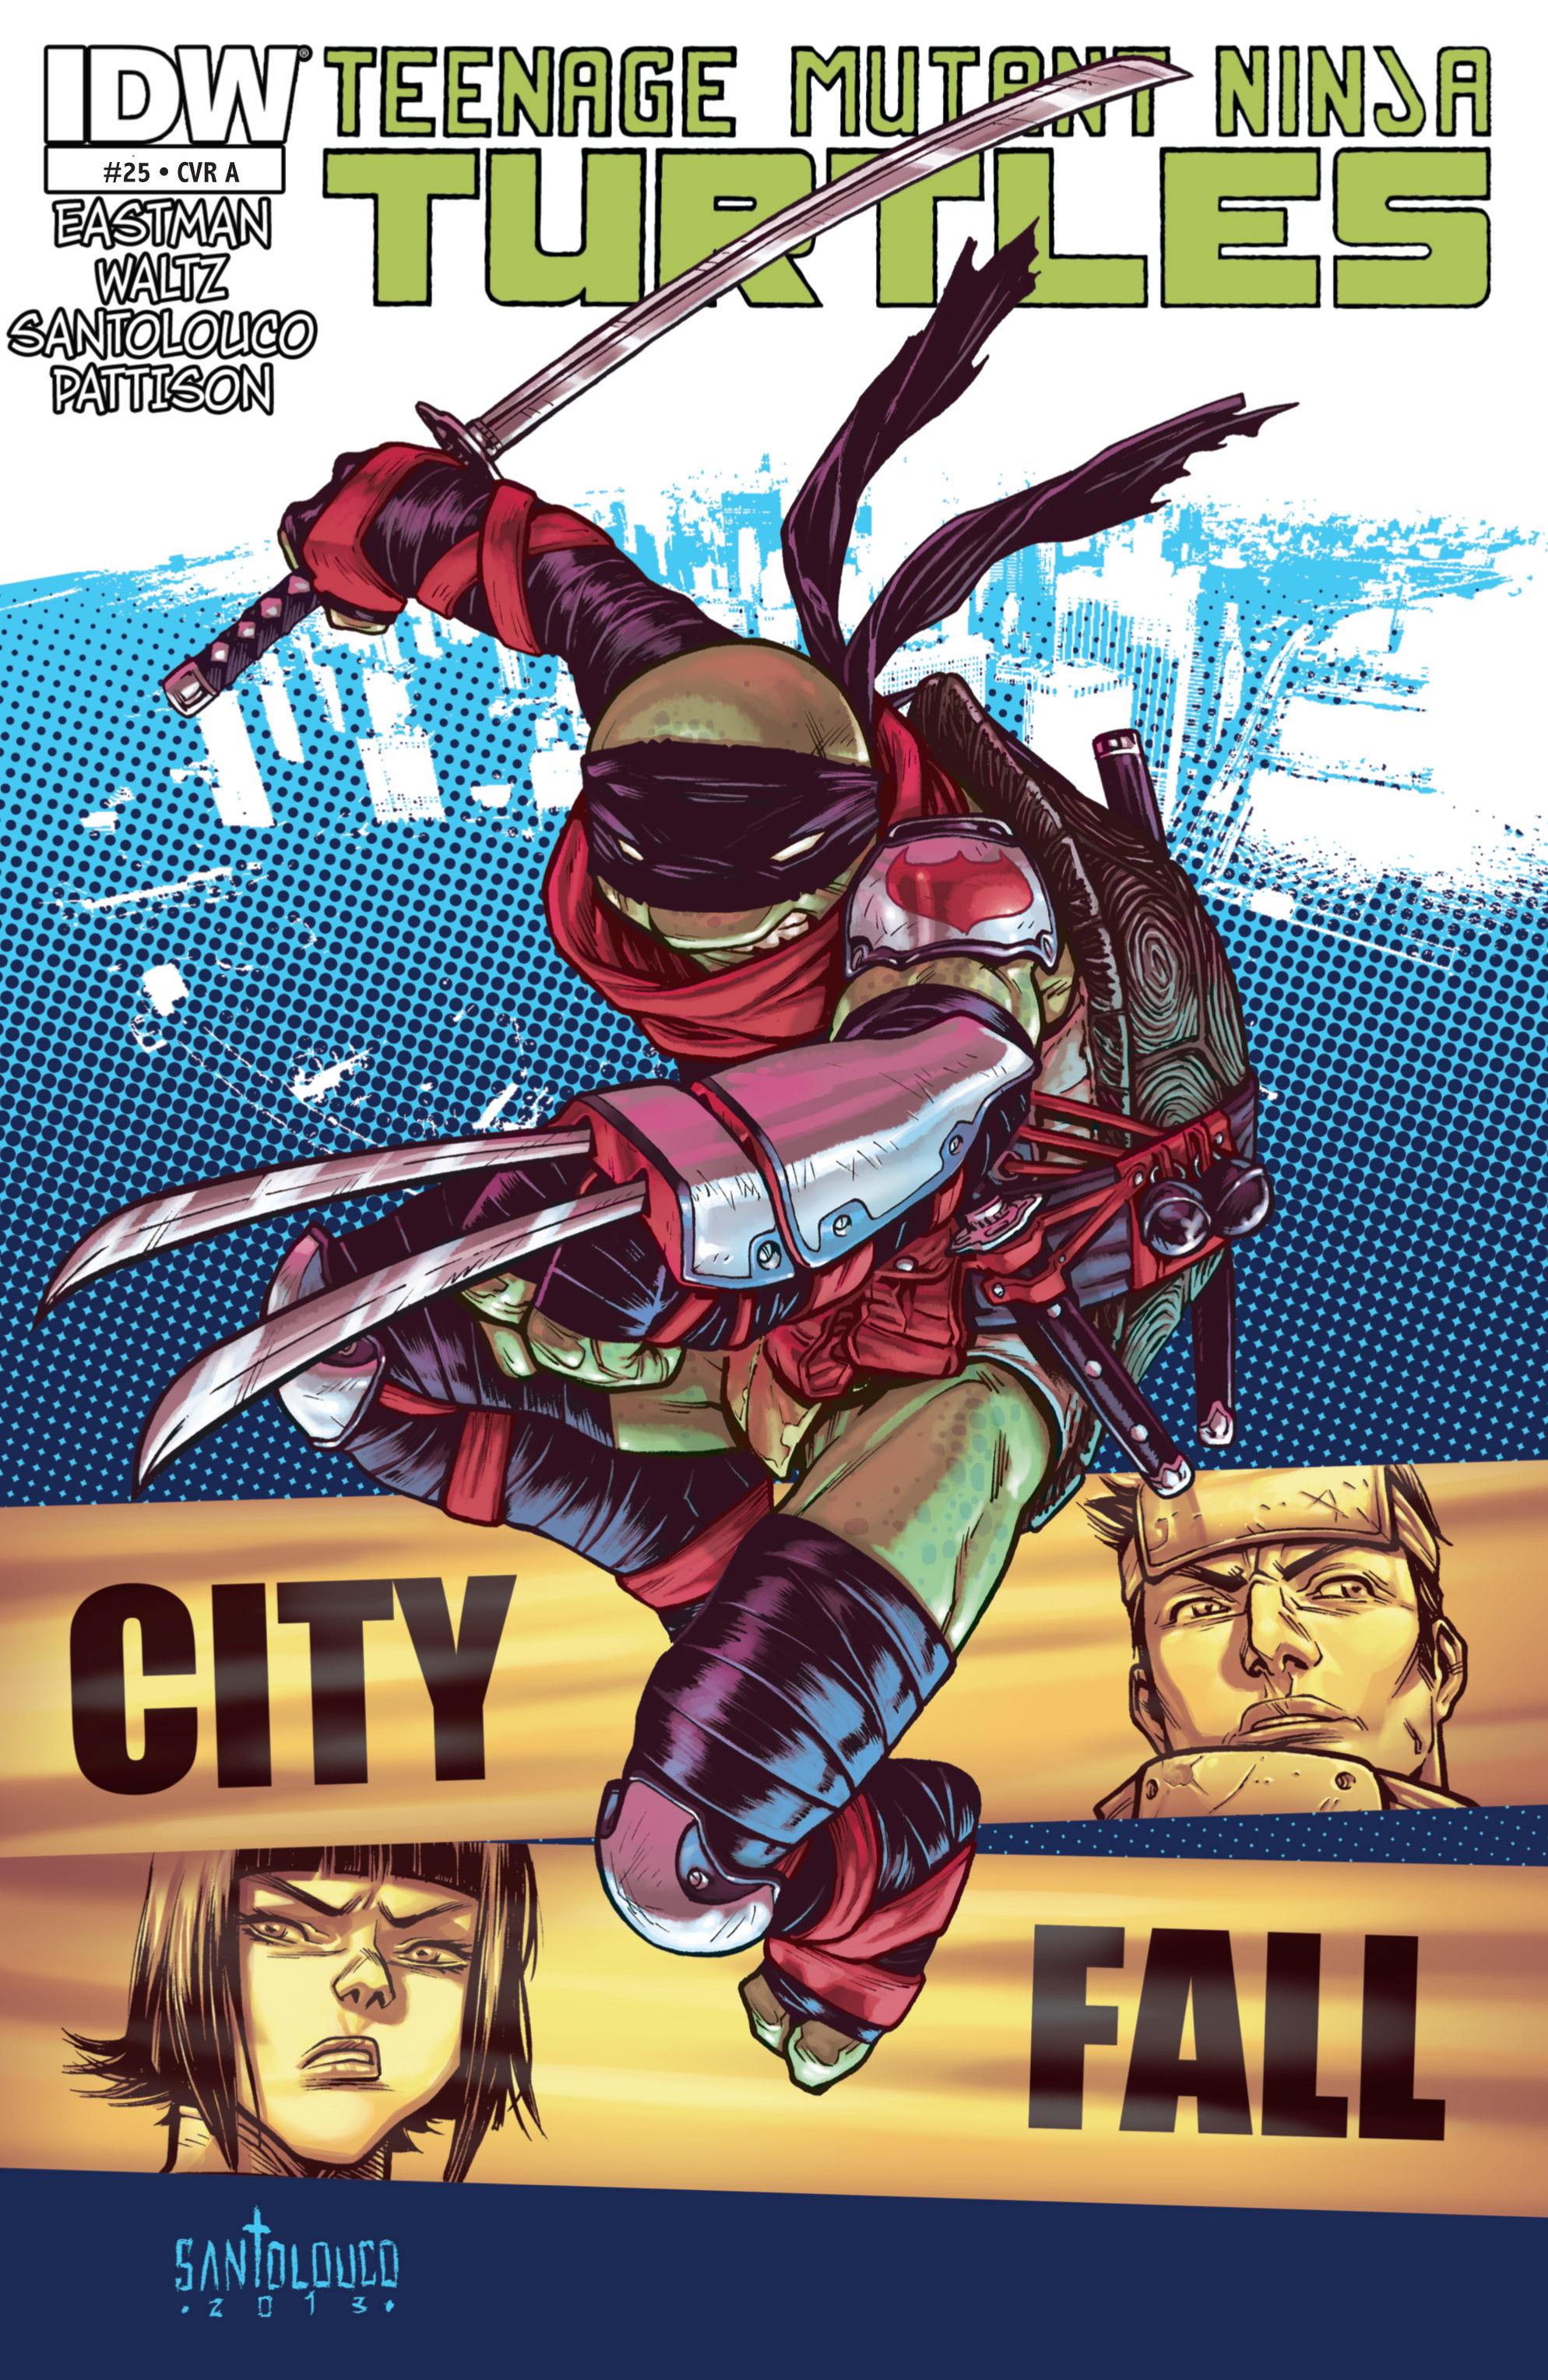 City Fall, part 4